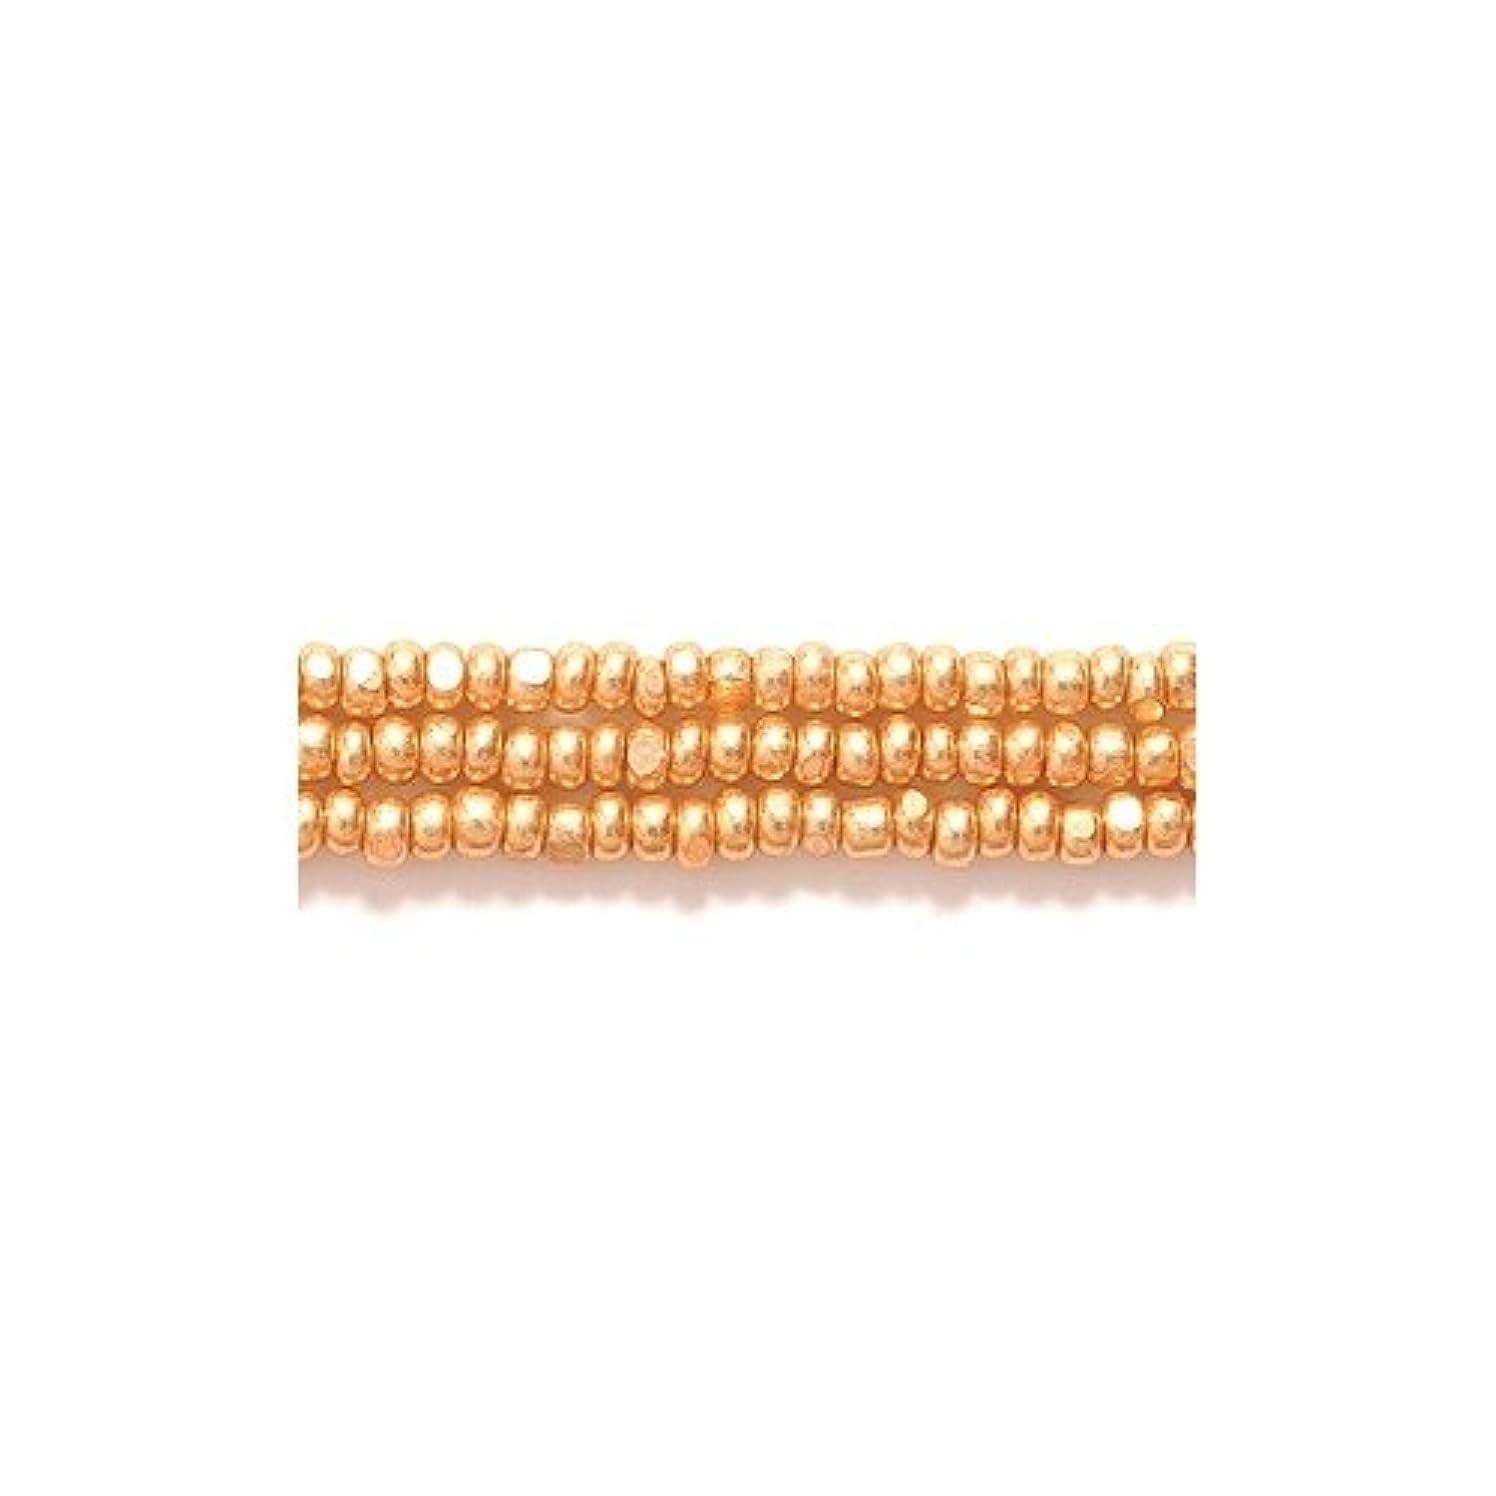 Preciosa Ornela Czech Seed Bead, True Cut Metallic Gold, Size 11/0